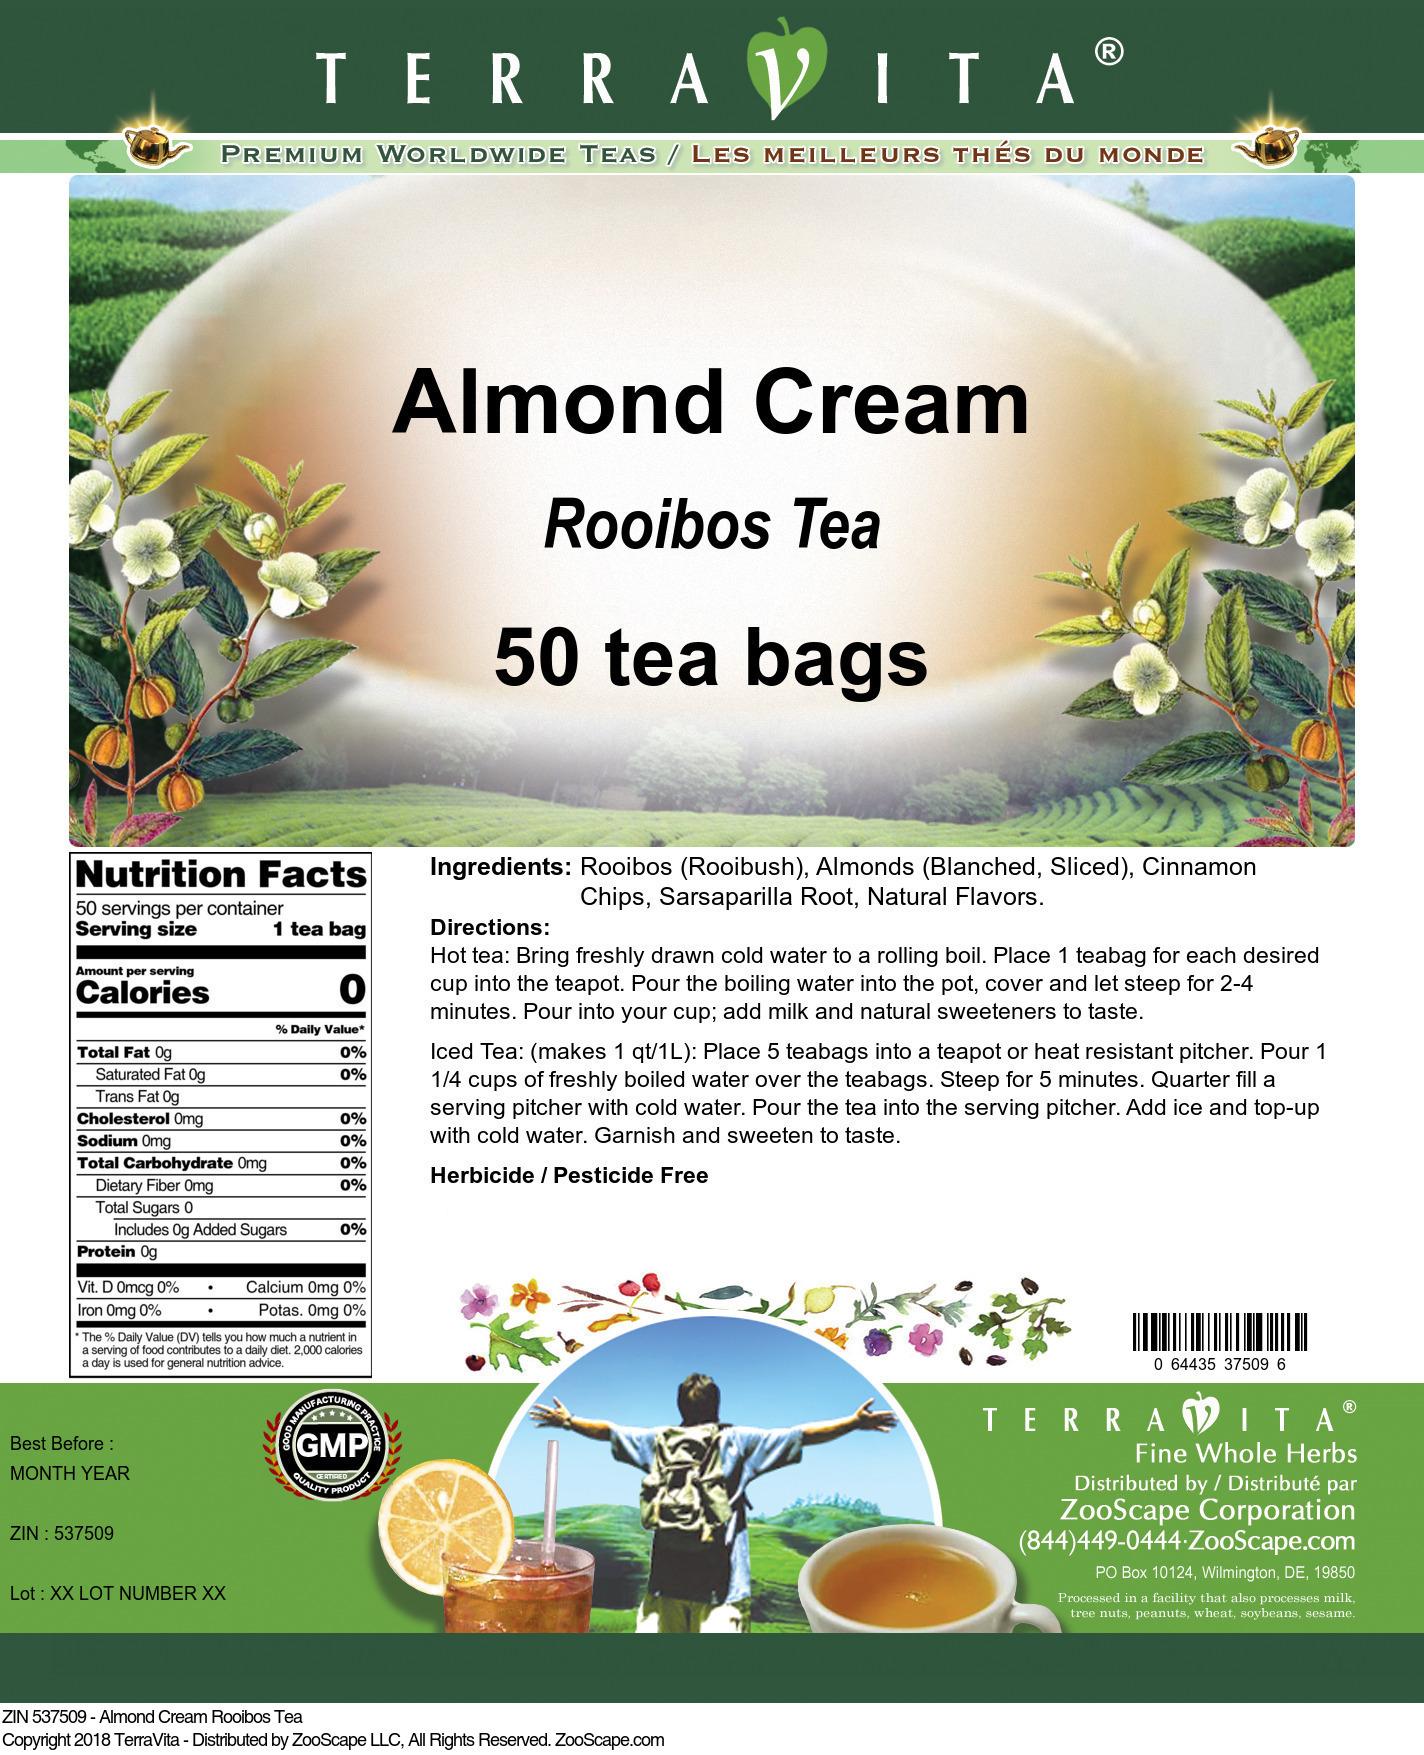 Almond Cream Rooibos Tea